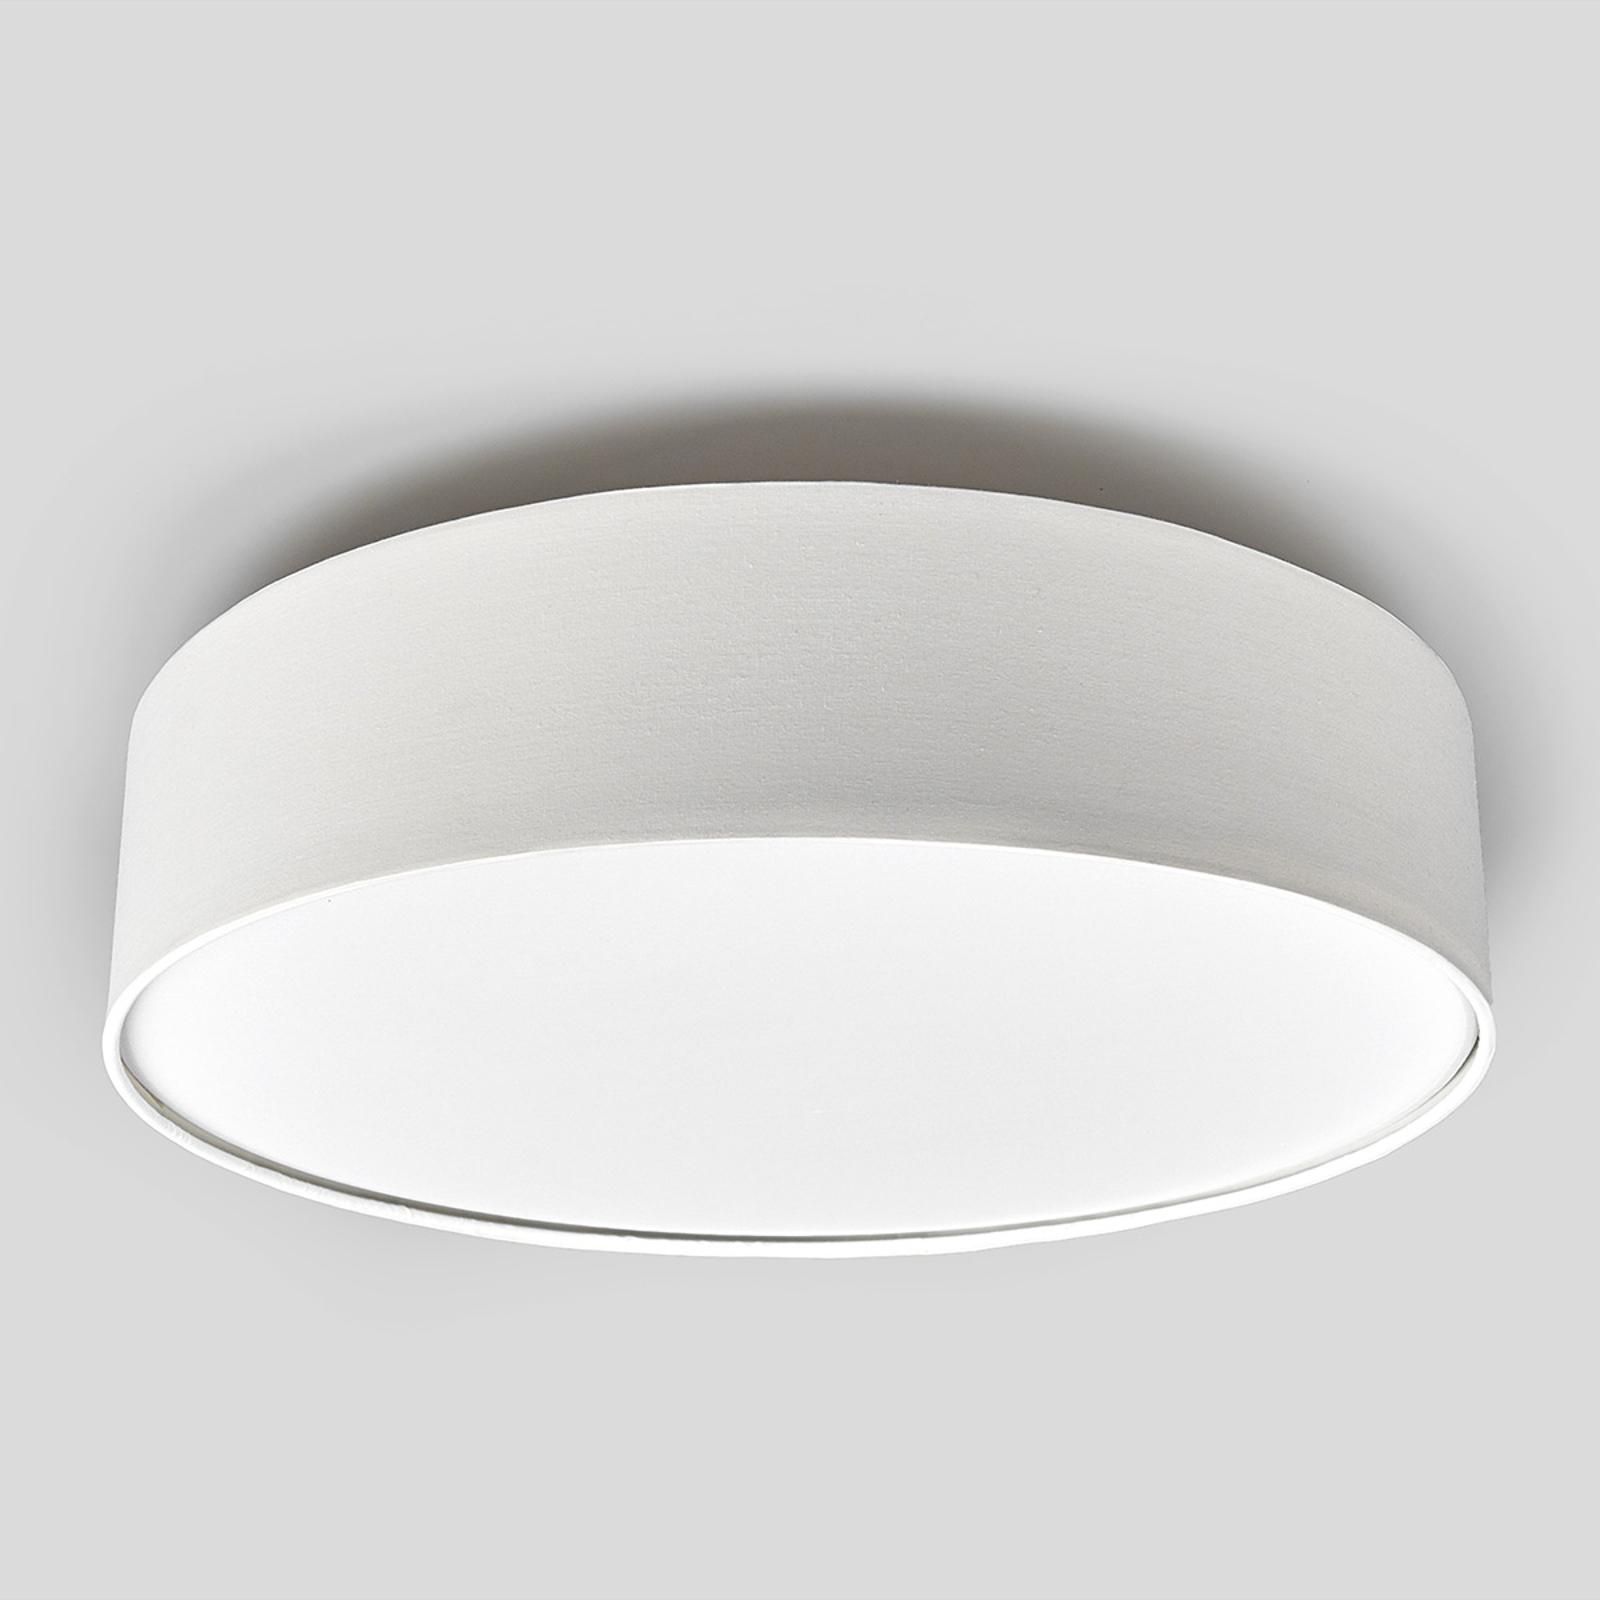 Deckenleuchte Sebatin mit E27-LED, 50 cm, creme